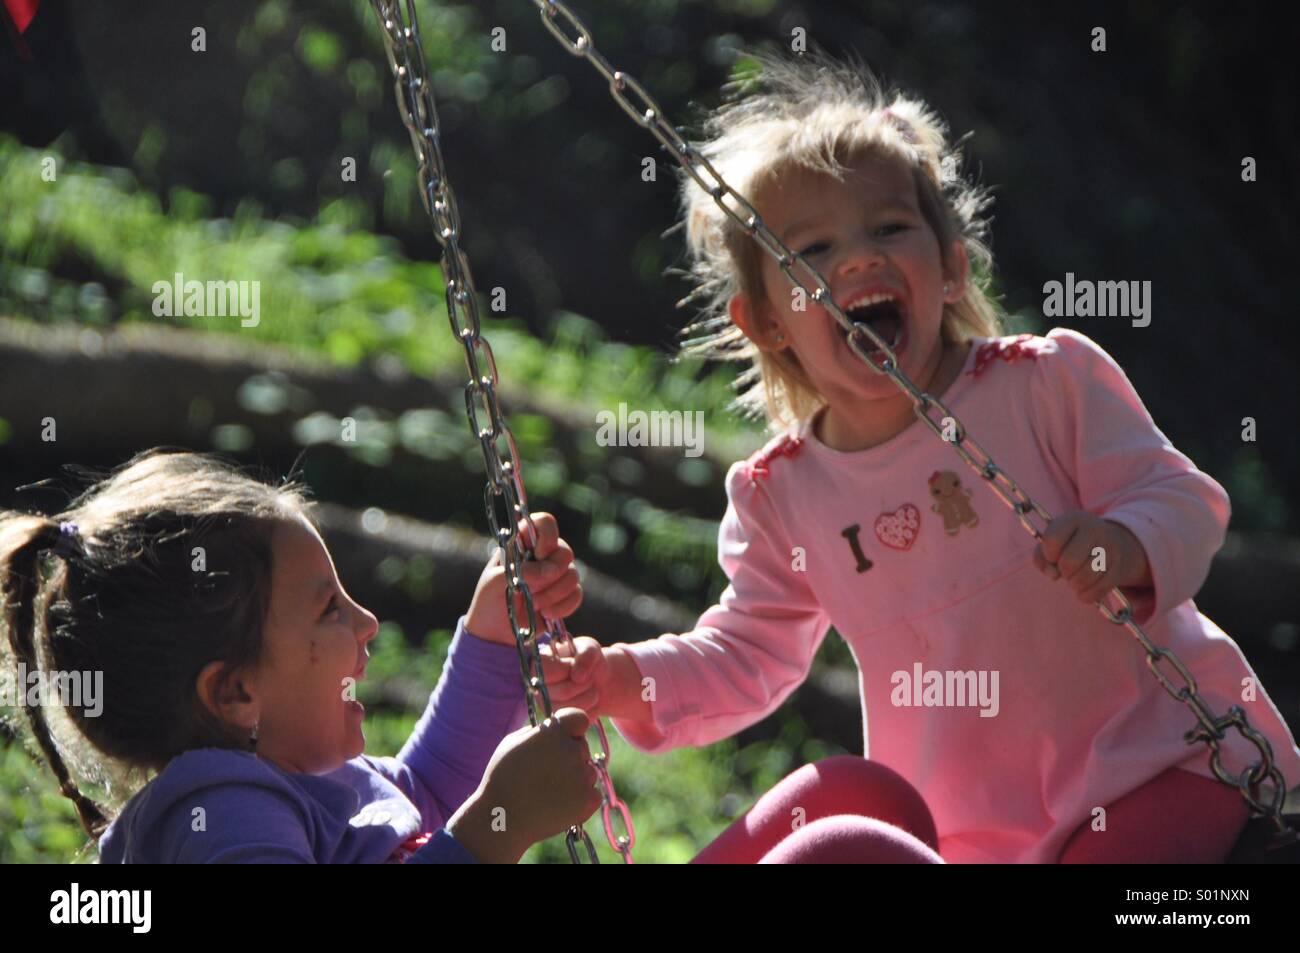 My new swing - Stock Image